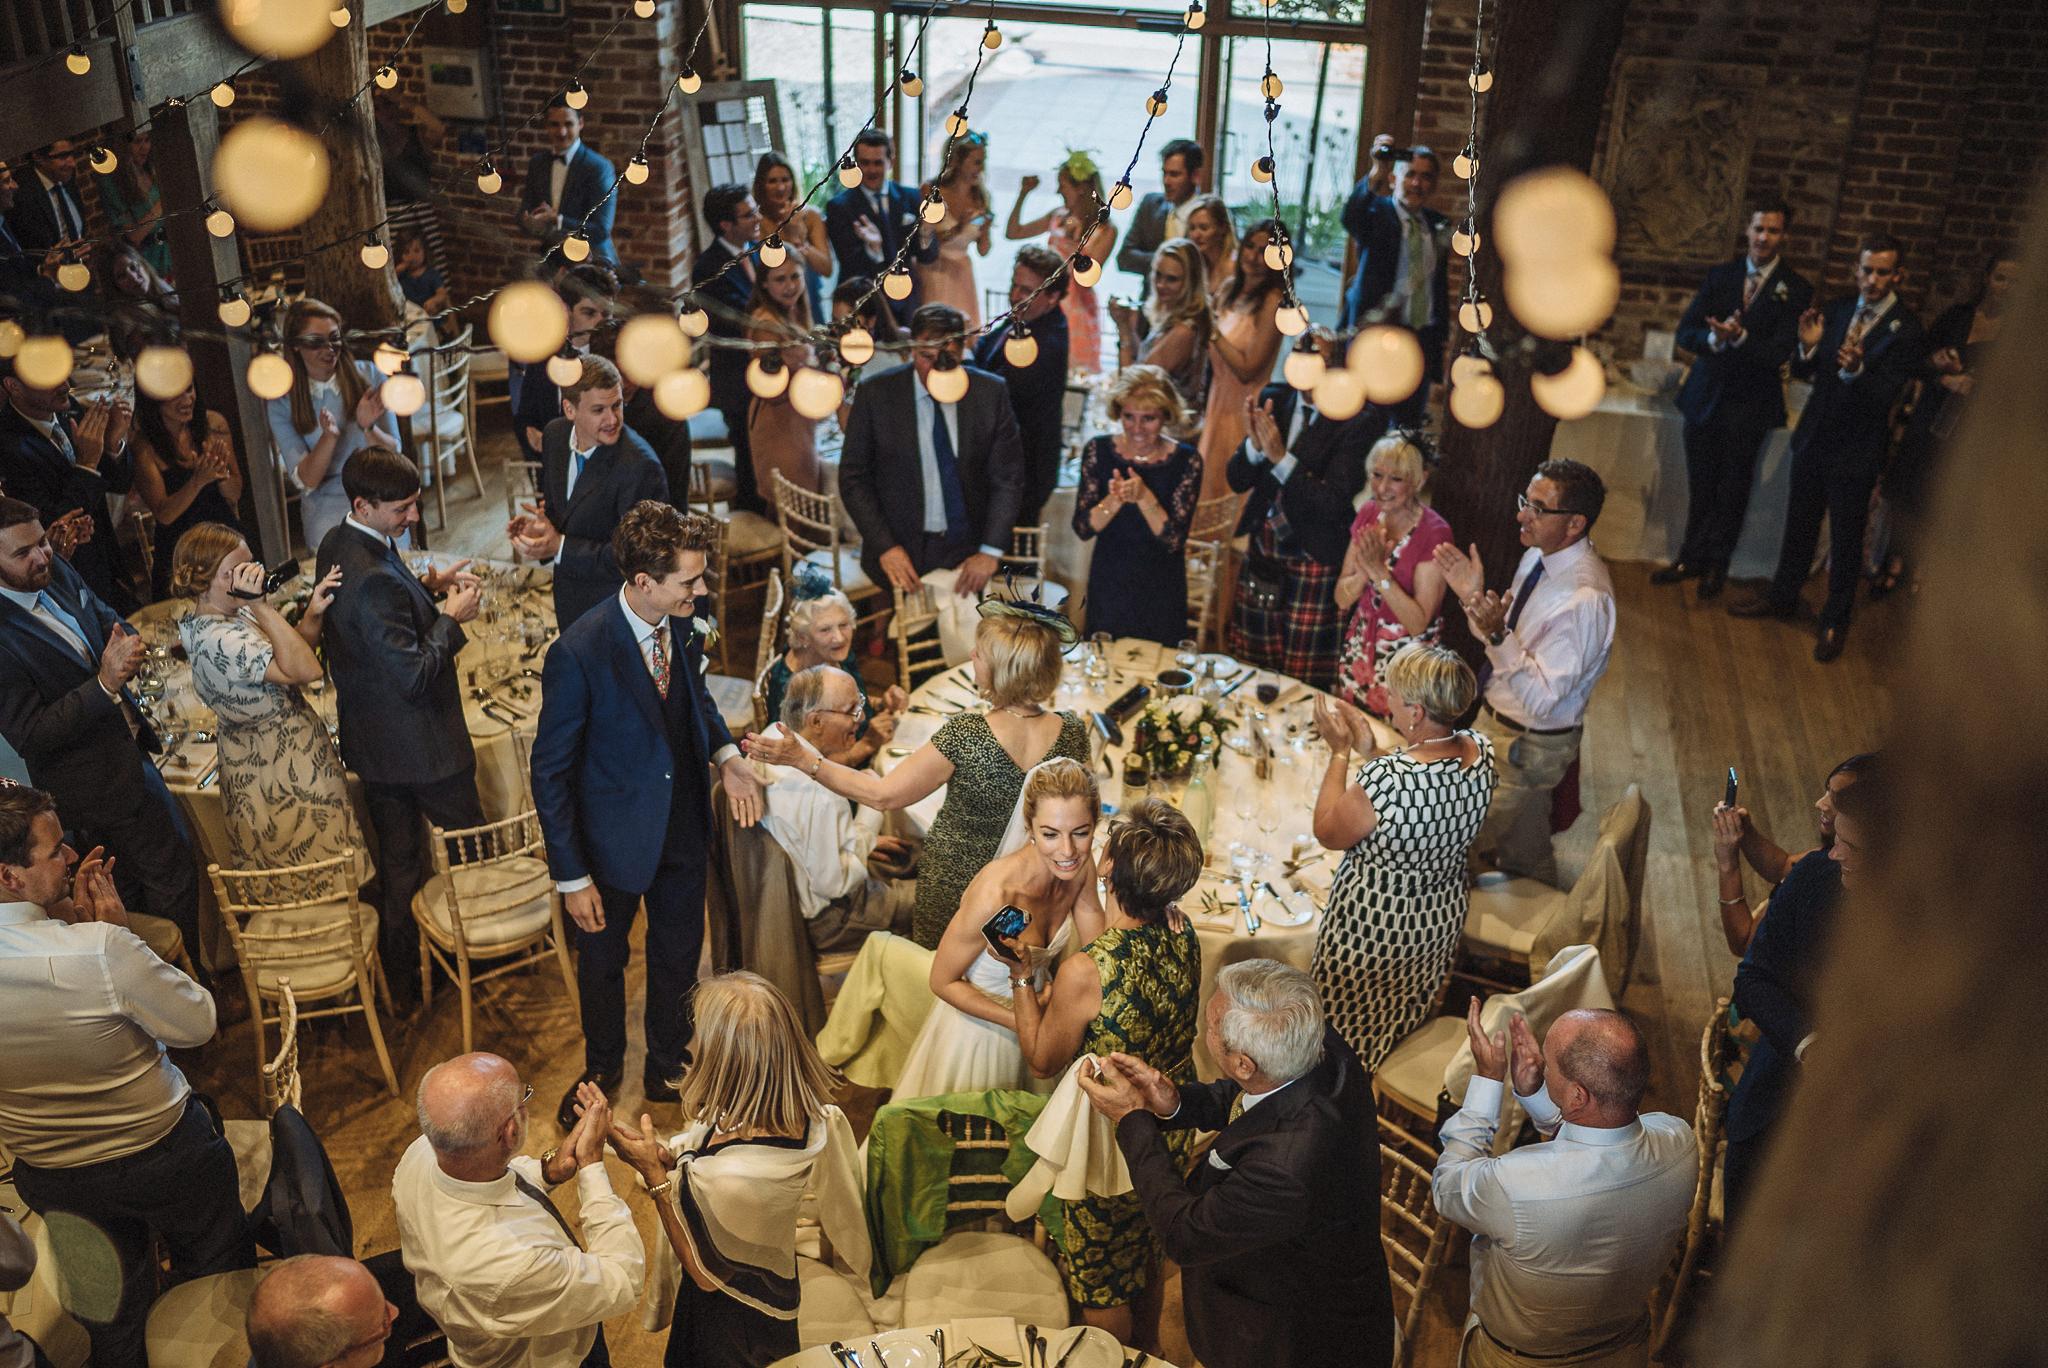 paul-marbrook-Gaynes-Park Wedding-Photographer-90100